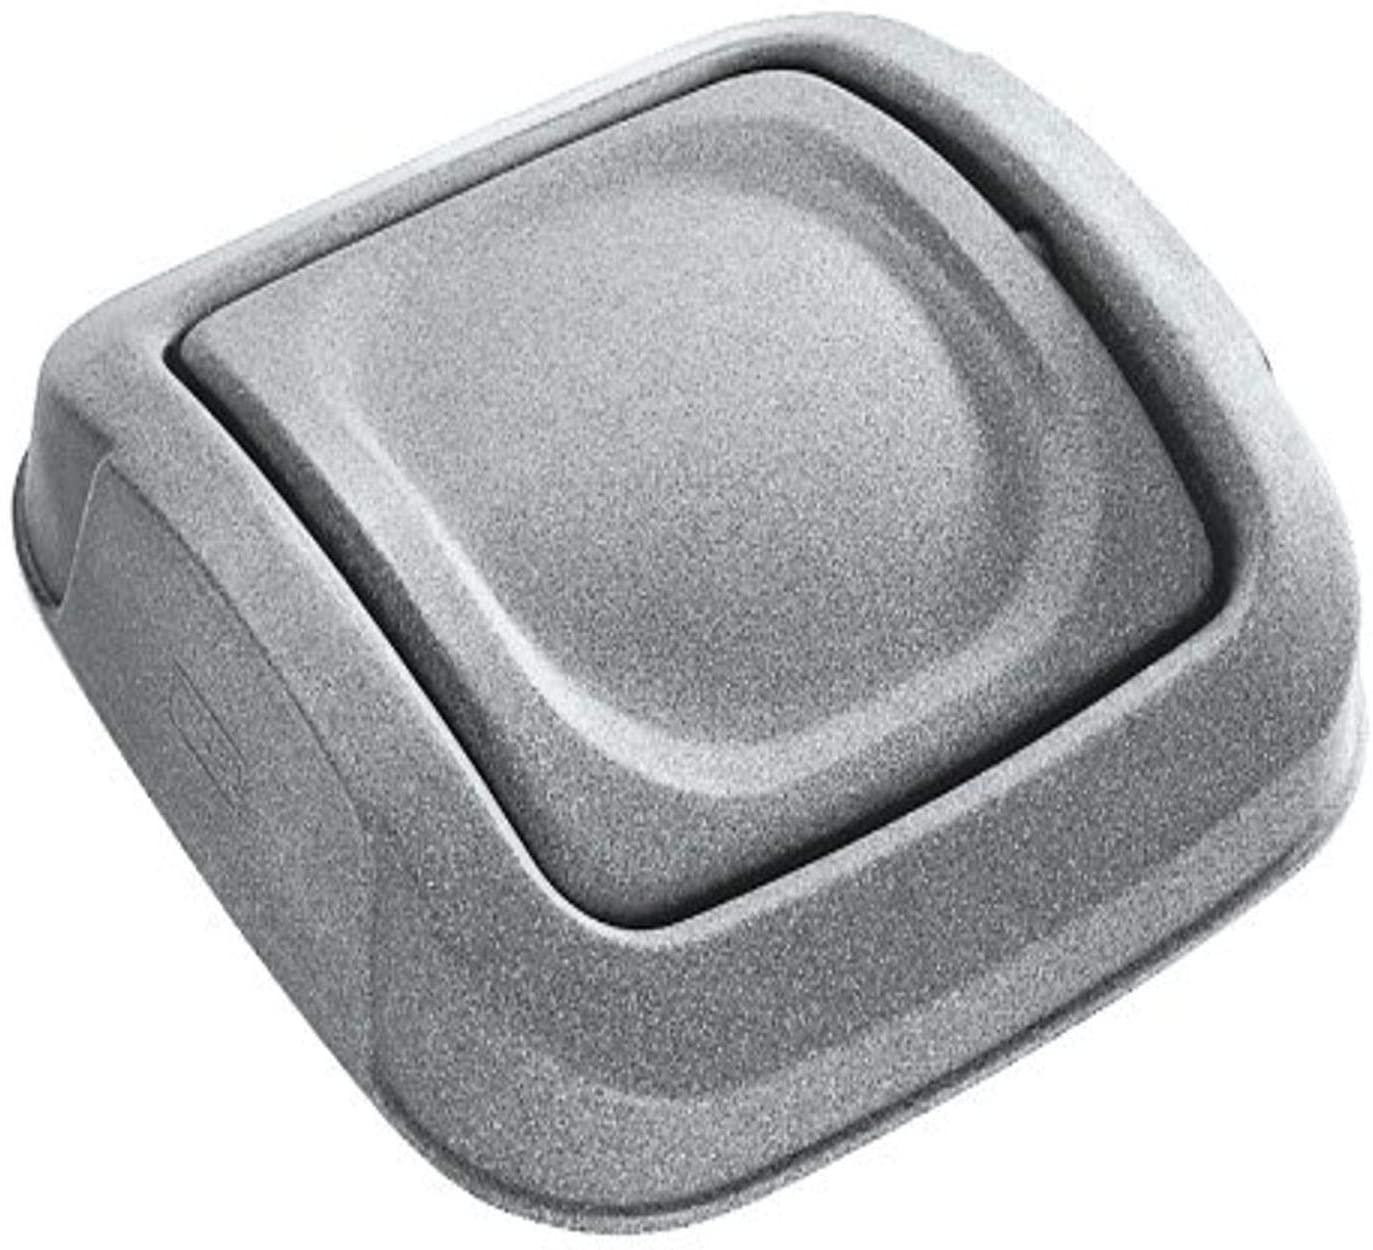 Toter SSD25-R1GST Slimline 25 Gallon Graystone Square Trash Can Swing Door Lid